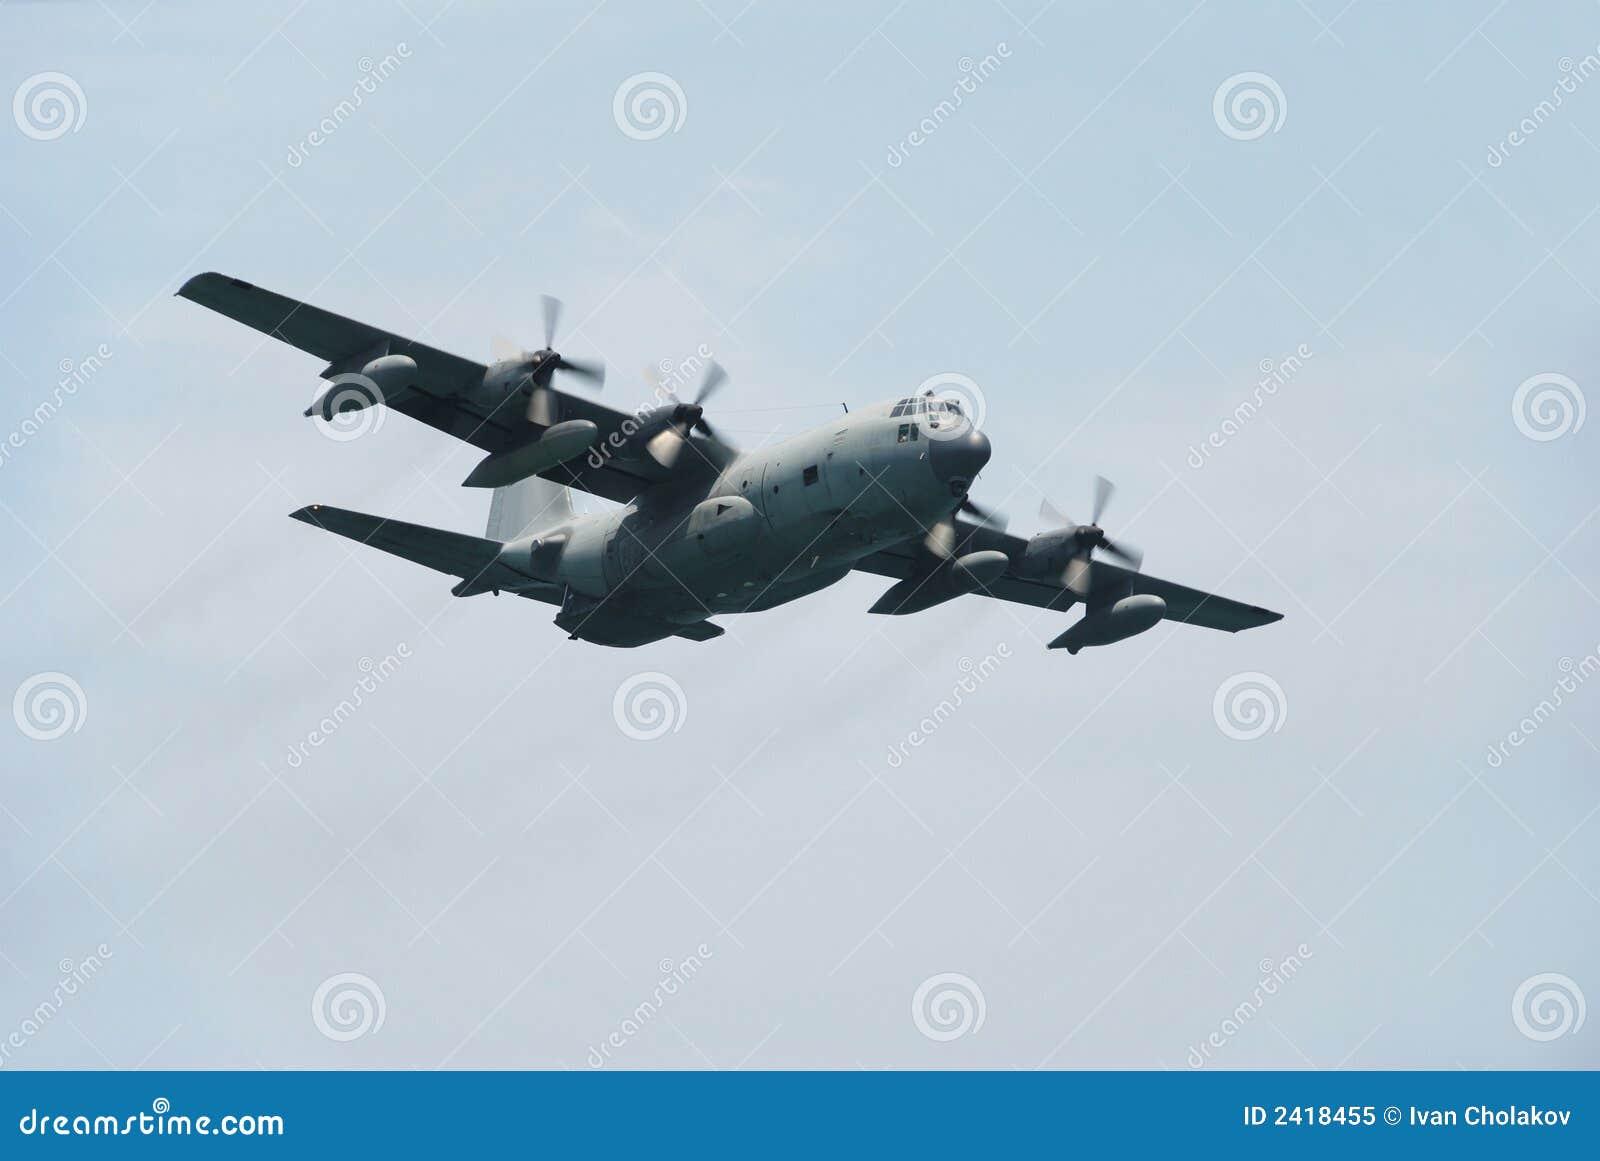 C-130 Military Transport Plane Royalty Free Stock Photo ...